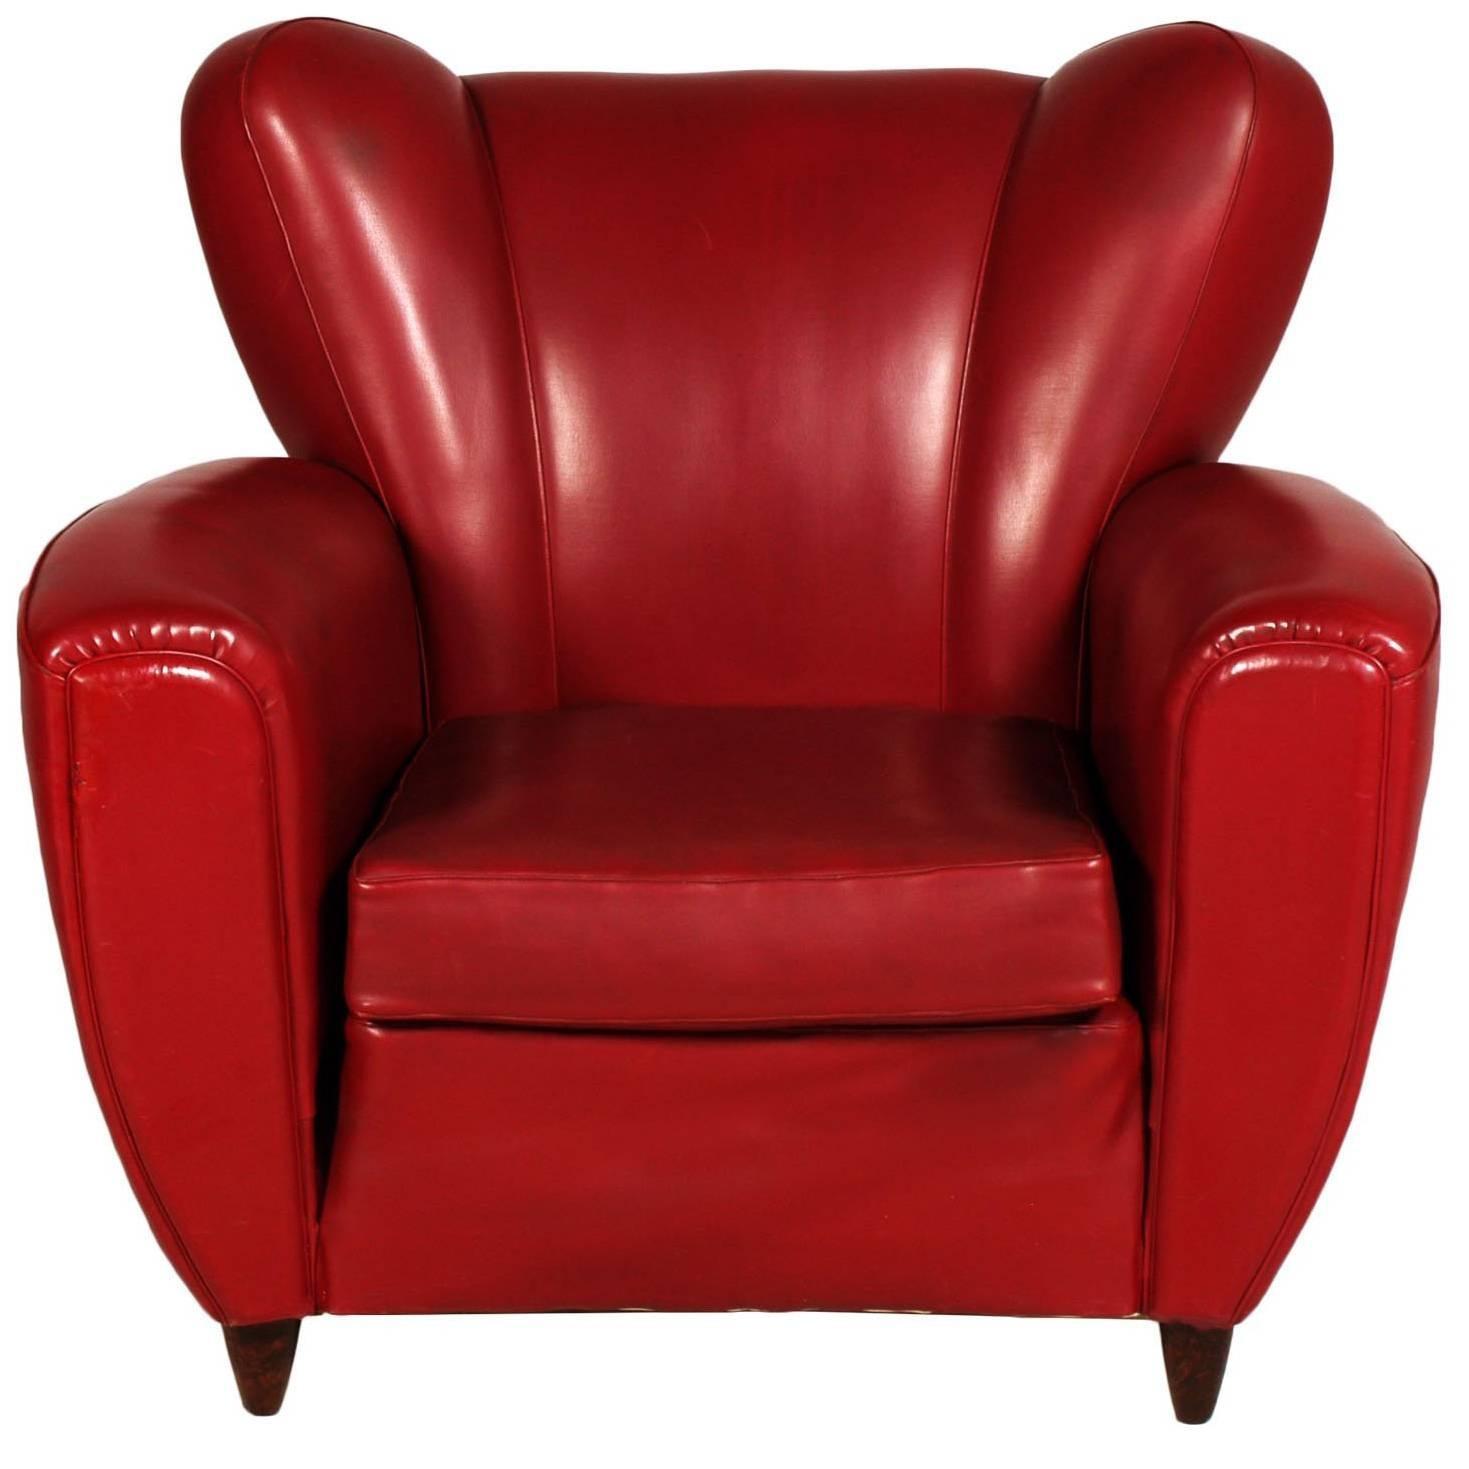 Italian Mid-Century Armchair Club Chair Art Deco Design Guglielmo Ulrich